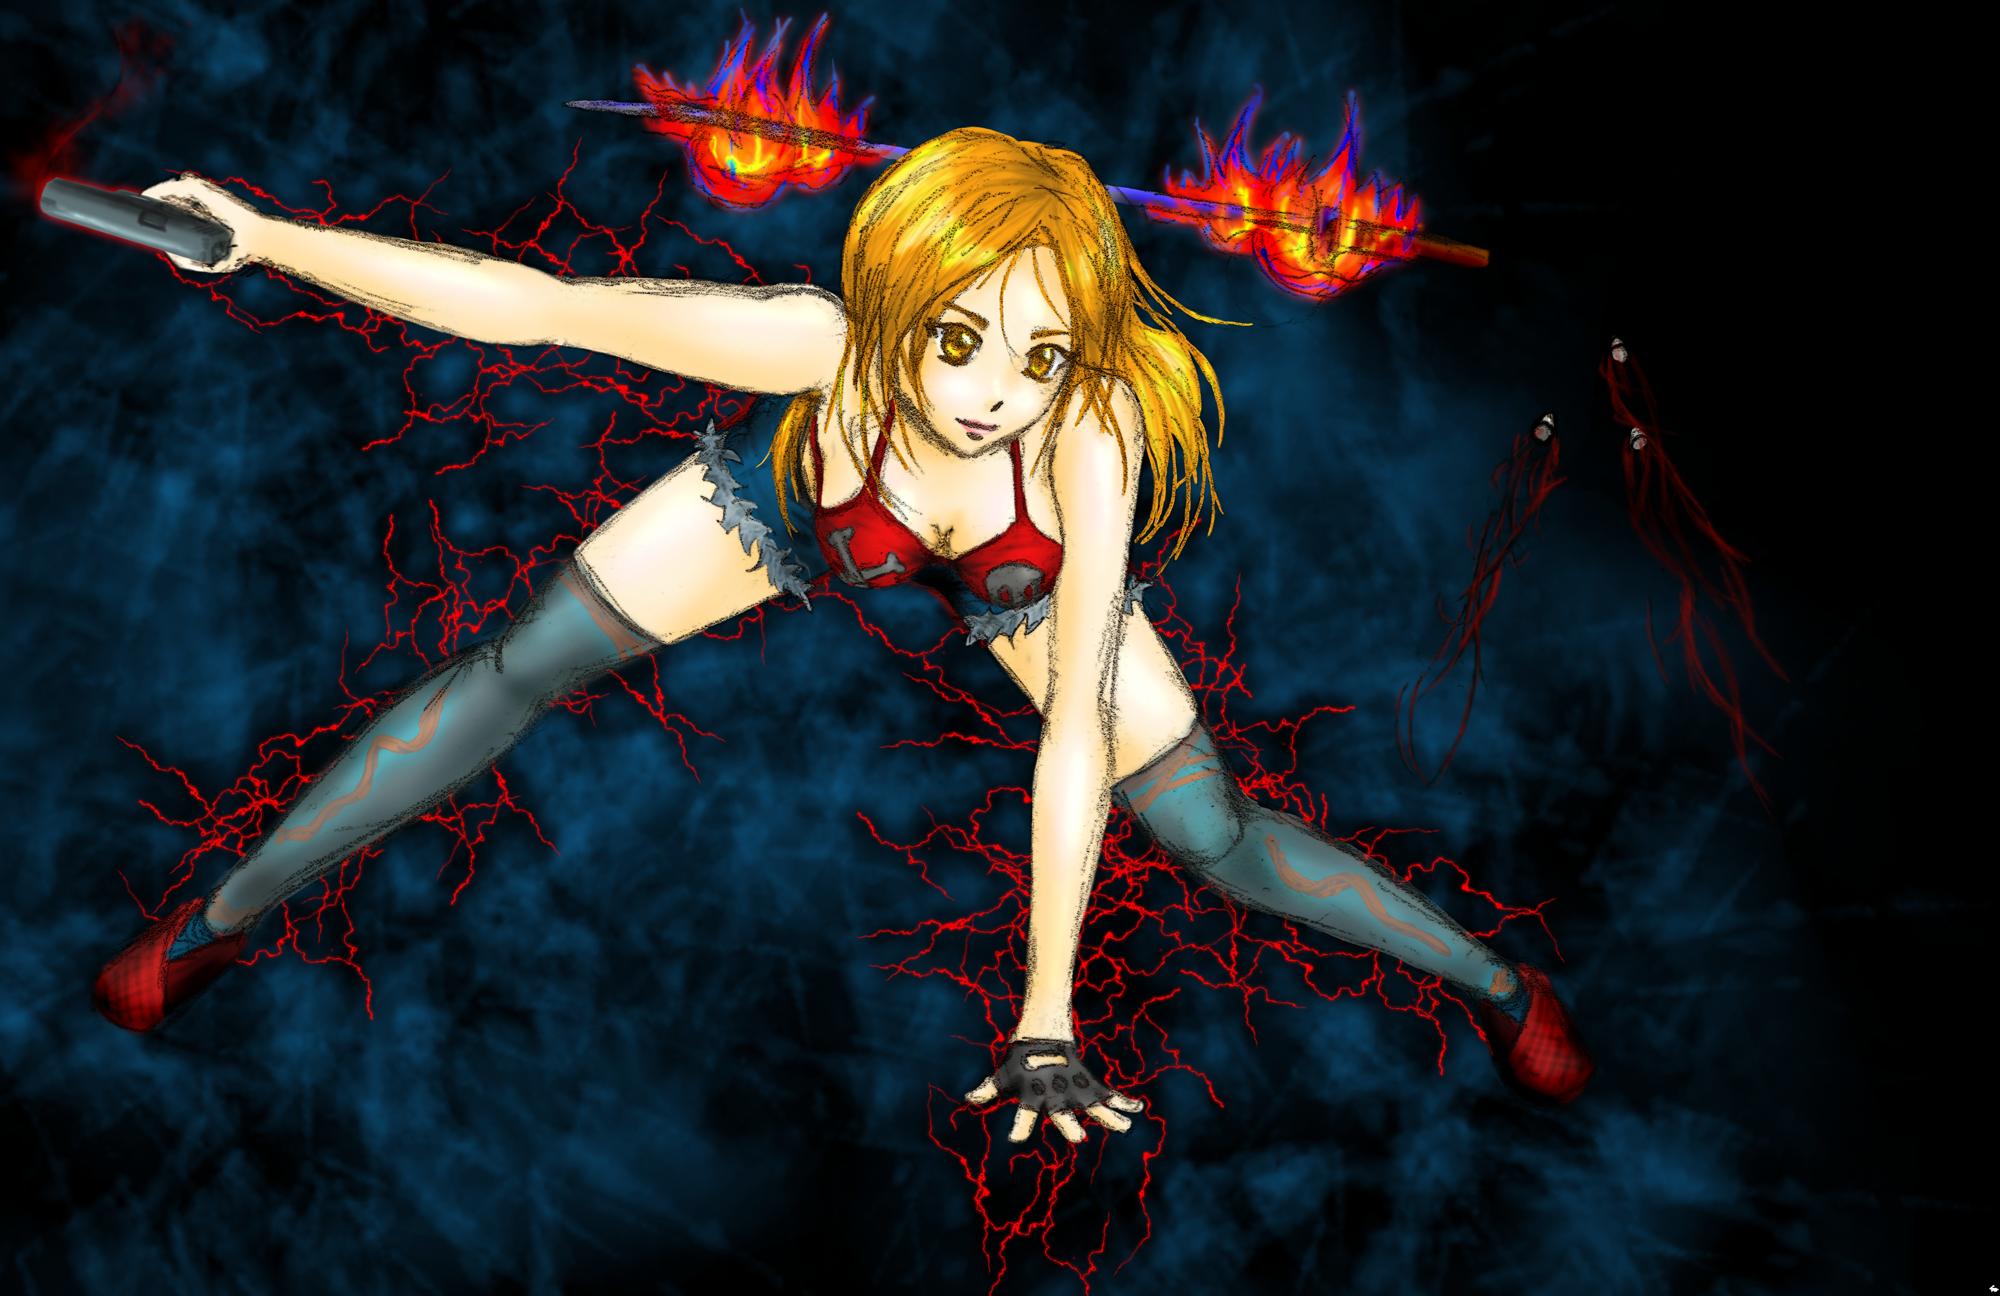 Yumemi action pose